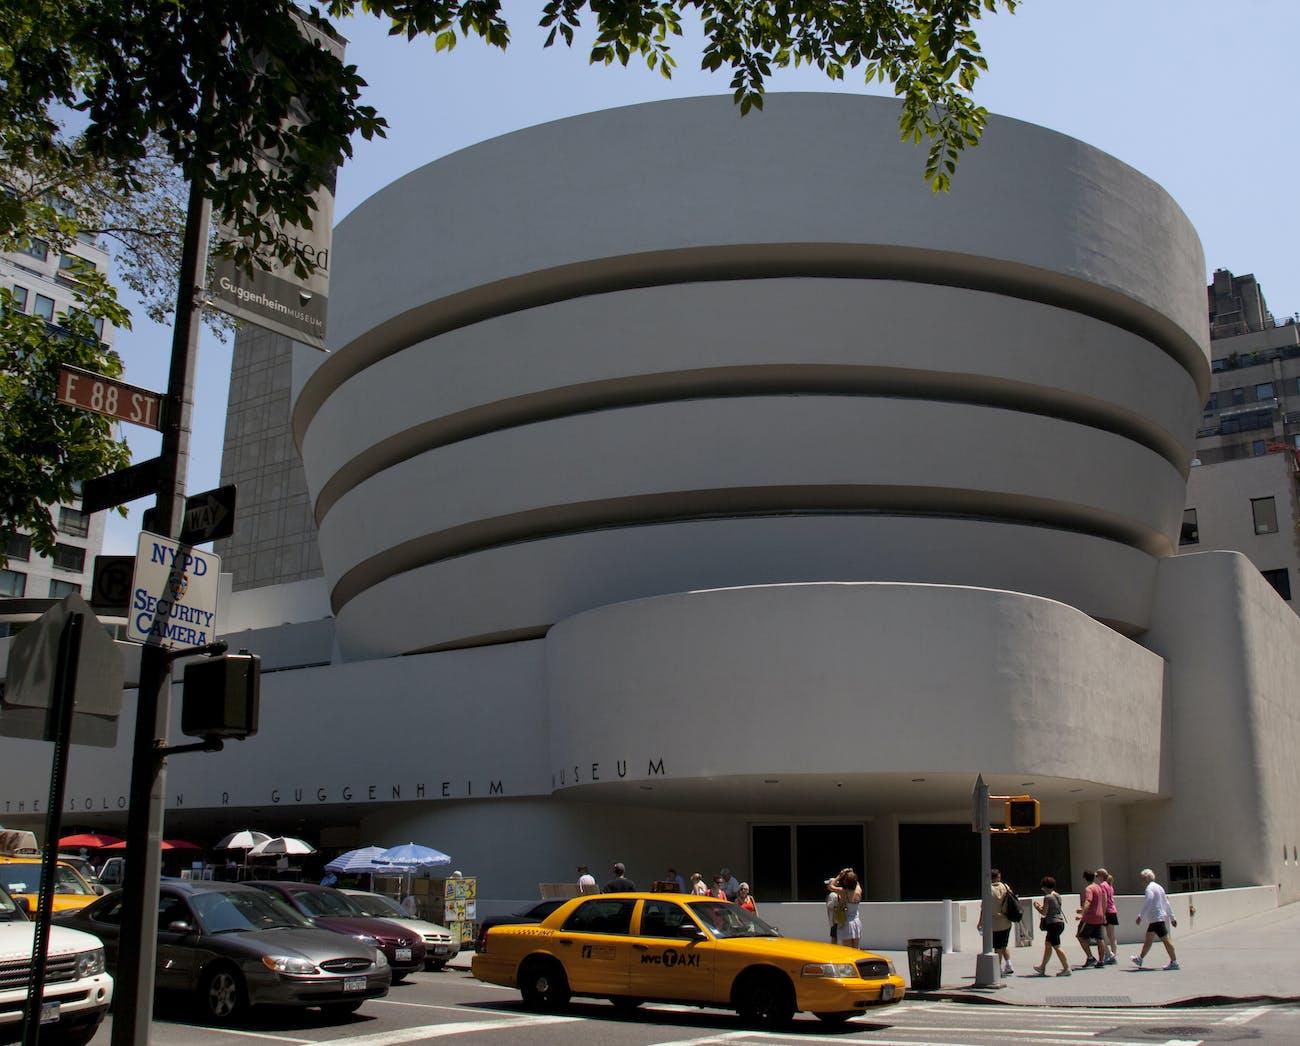 Guggenheim Museum NYC 4688736604 4fb3eb1def